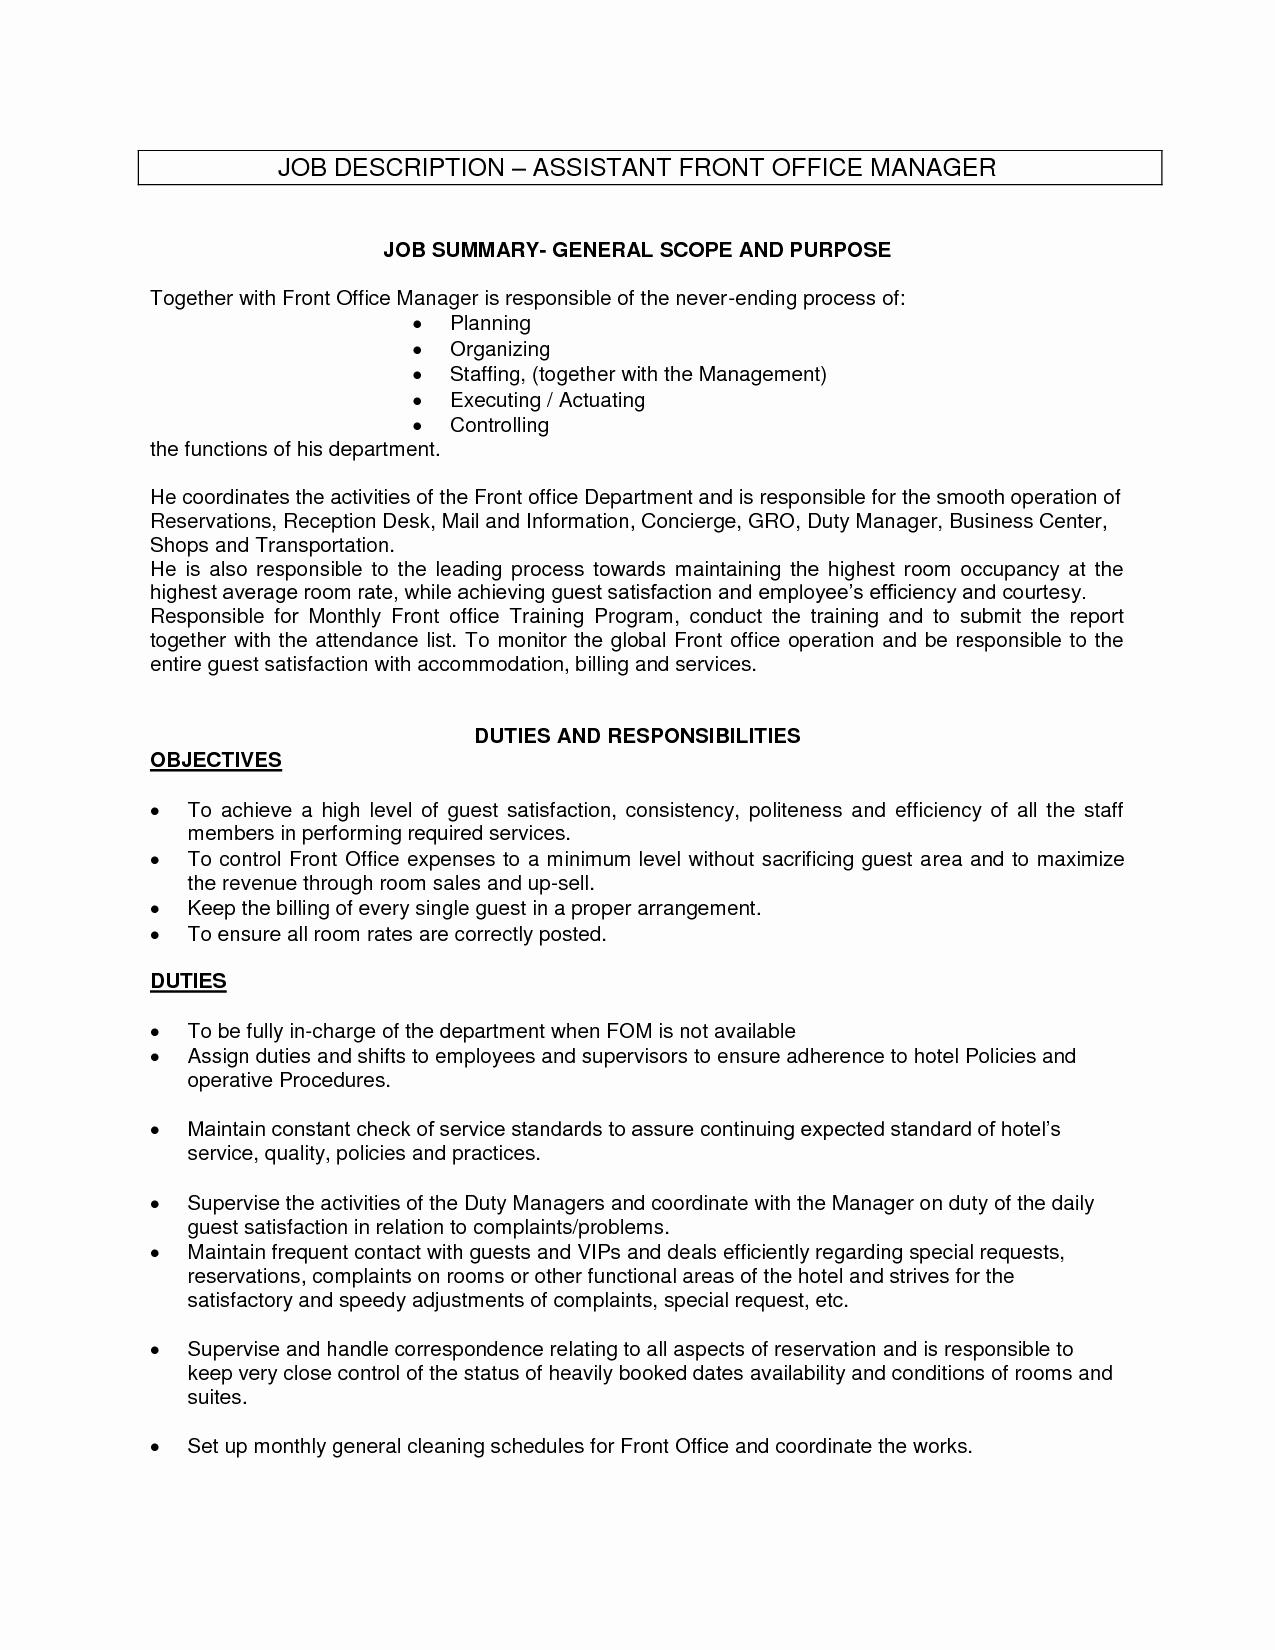 Medical Fice assistant Job Description for Resume